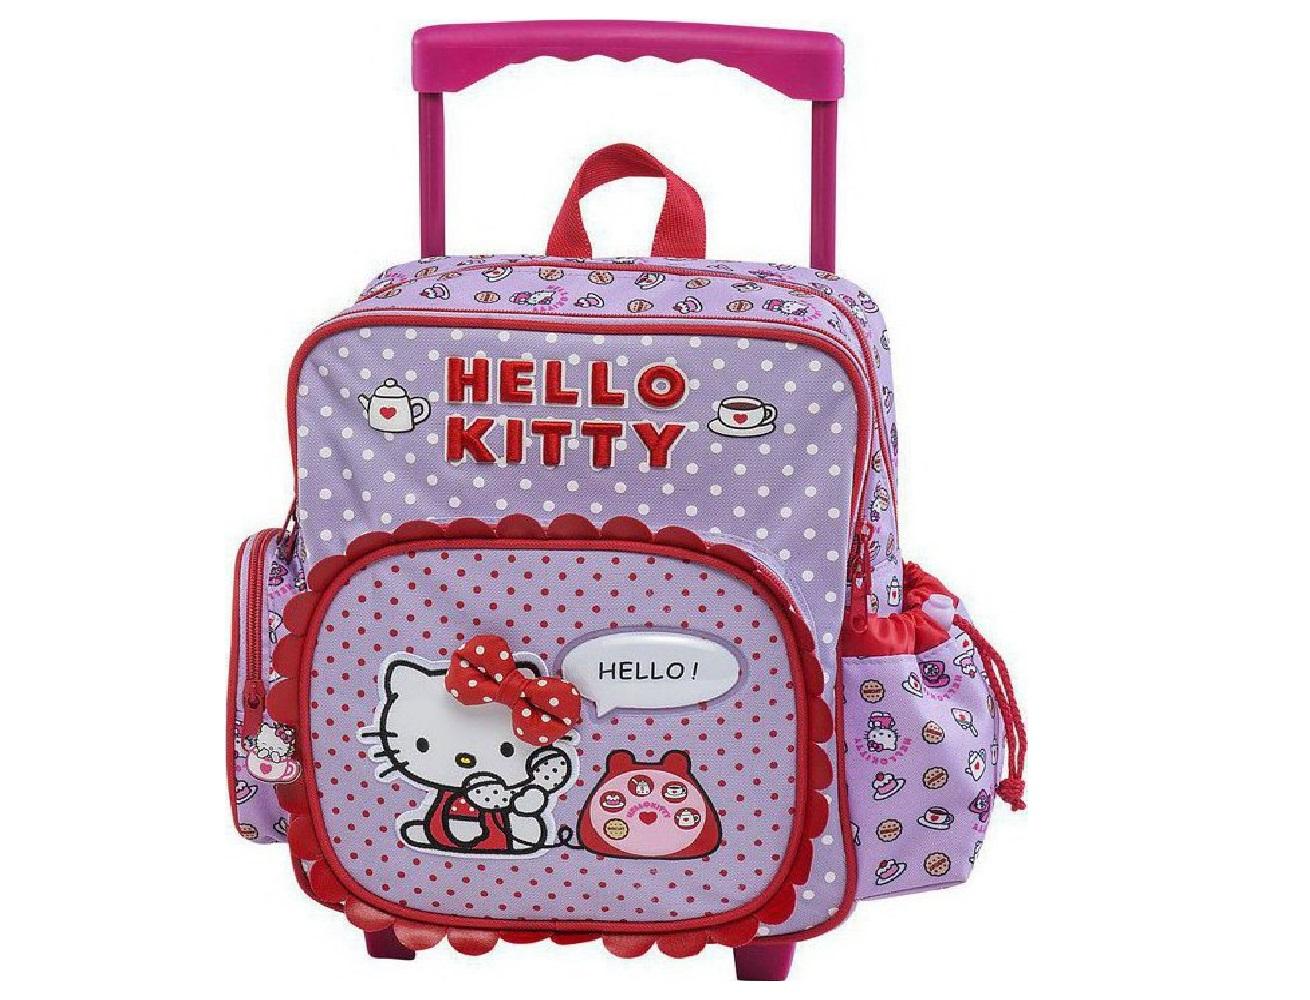 021dbe96fd Σακίδιο τρόλεϊ Hello Kitty - Graffiti - 255716 - Lexicon Shop